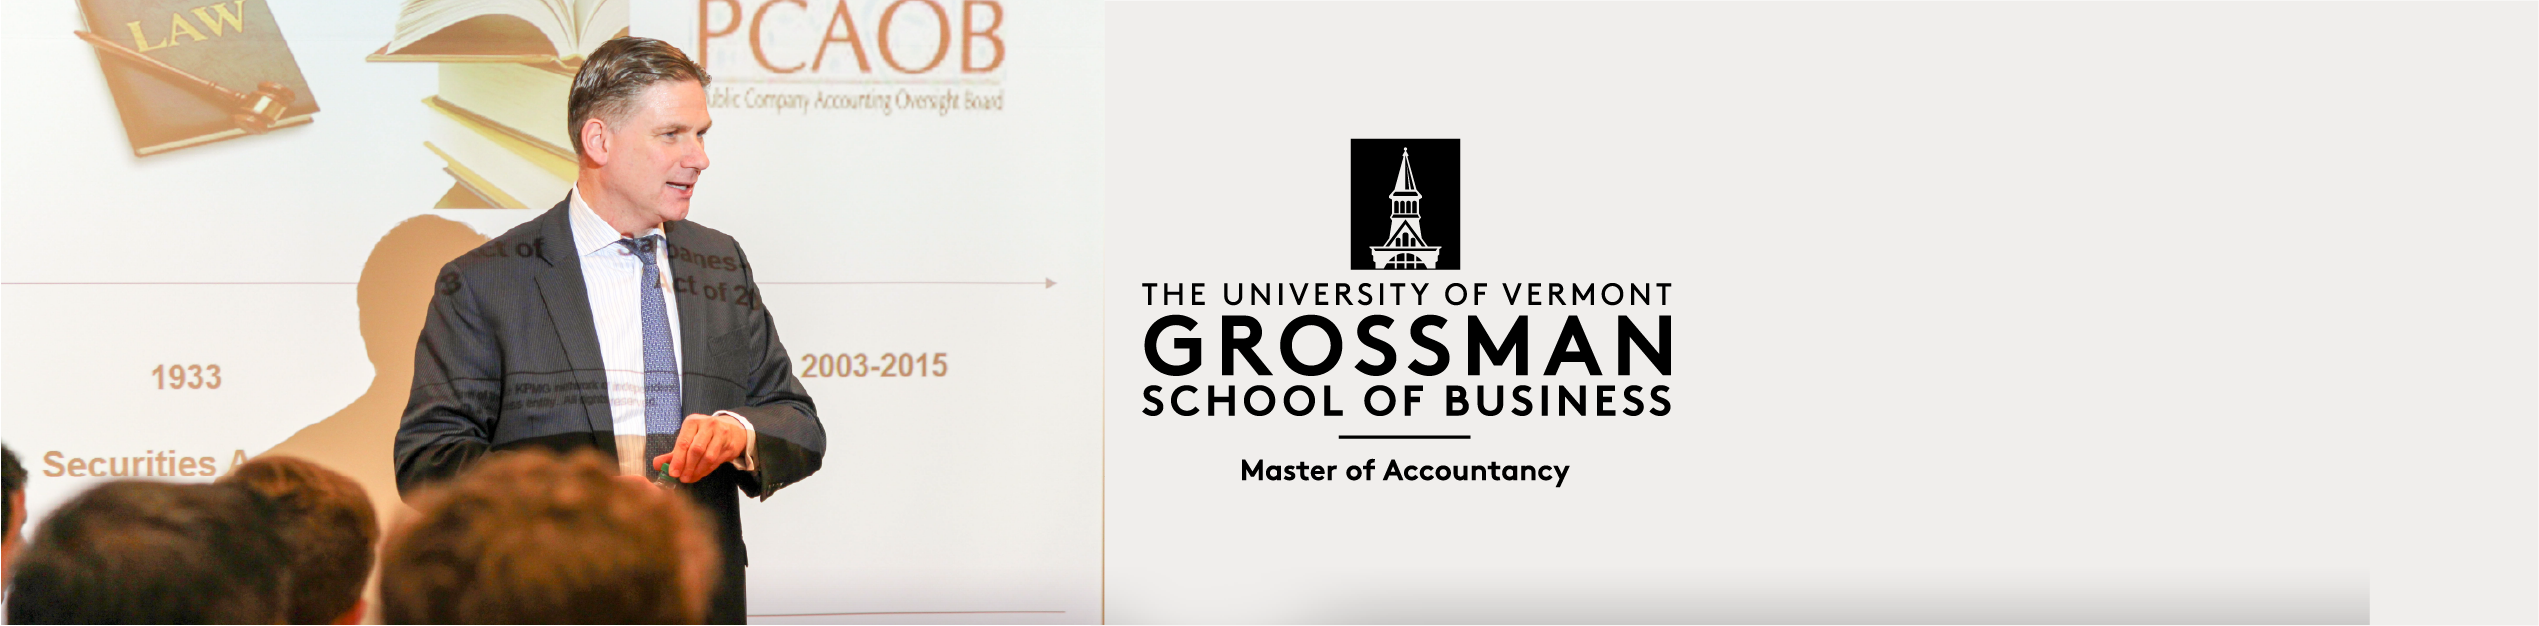 macc, uvm, master of accountancy